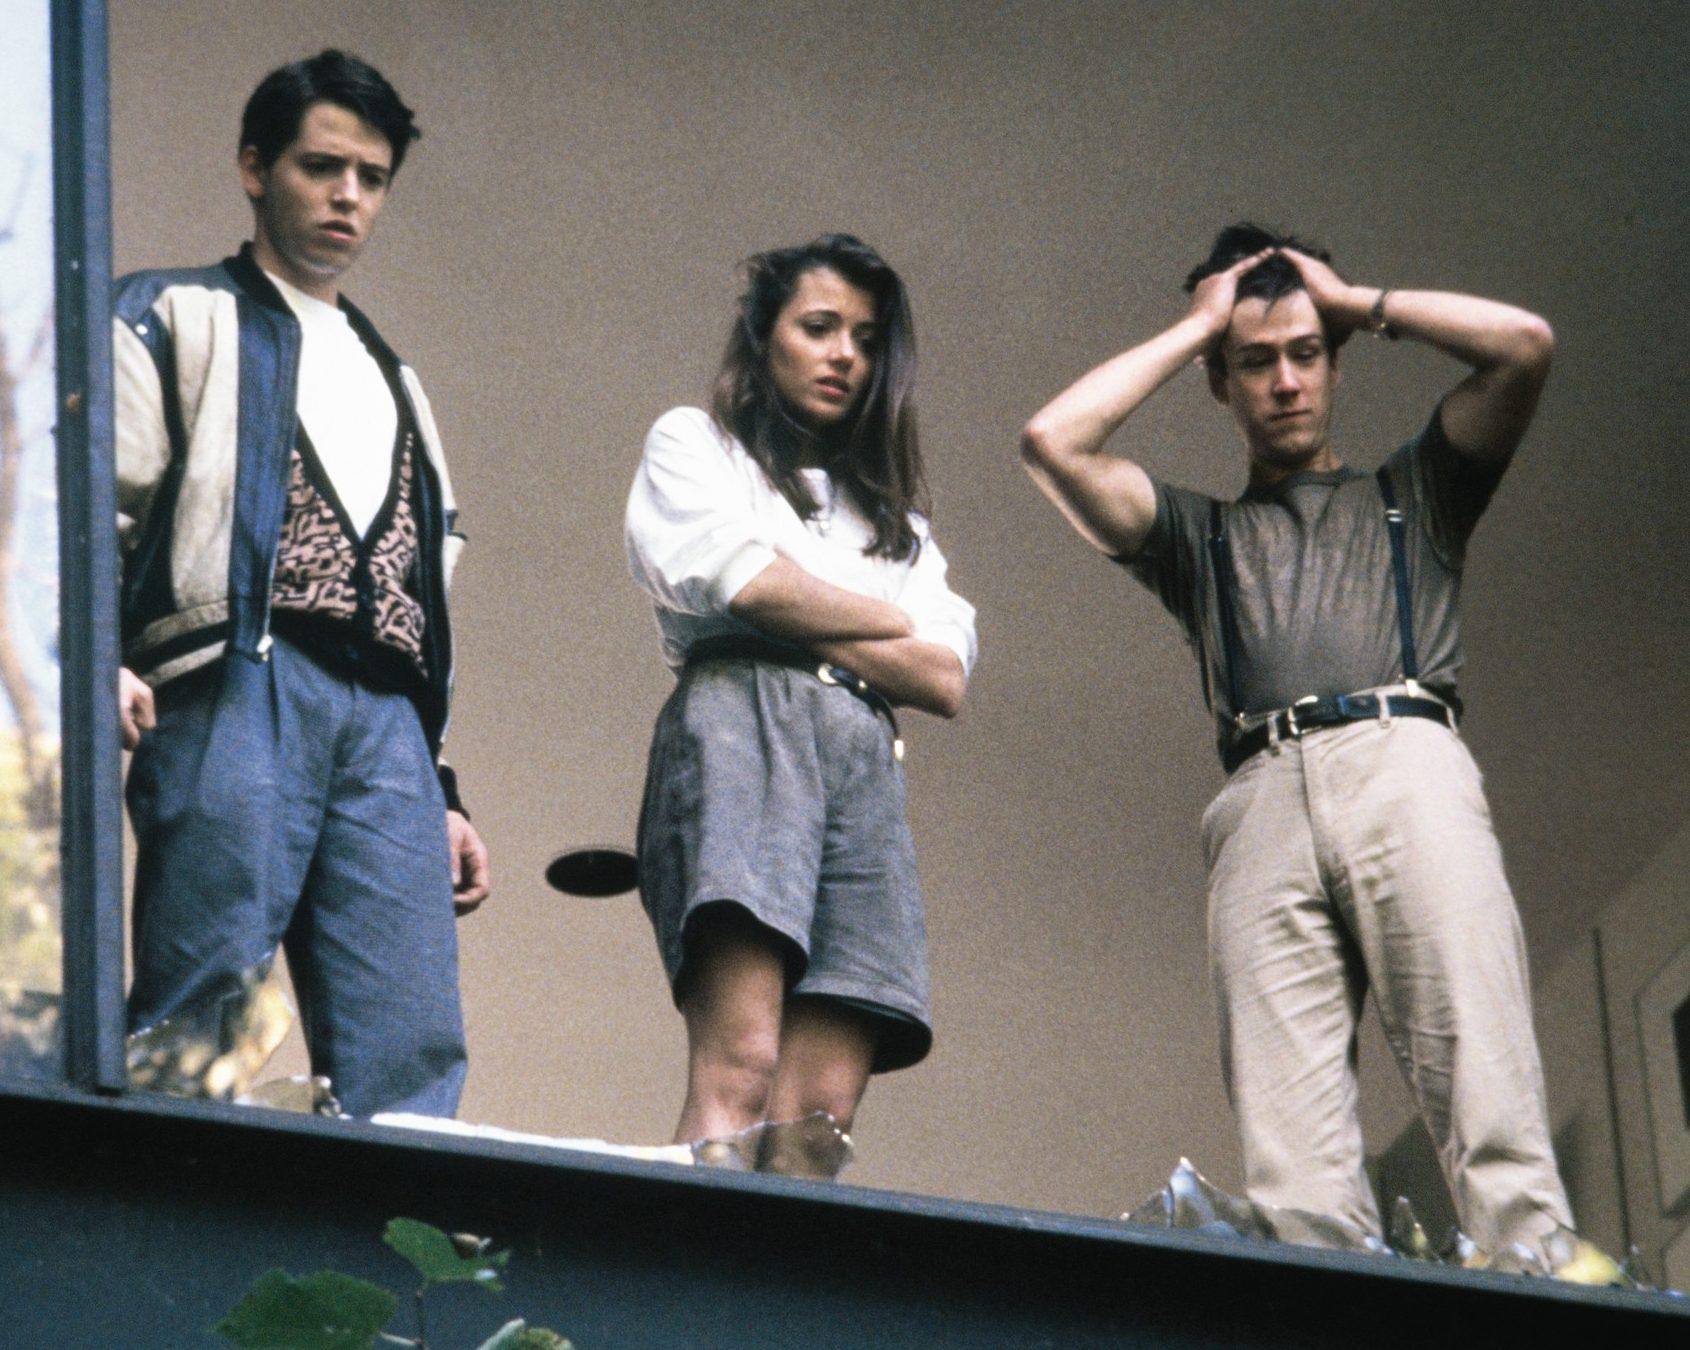 MV5BMjU4MjMzMzU4OV5BMl5BanBnXkFtZTcwNzA0OTI2OQ@@. V1 e1617030257449 20 Things You Probably Didn't Know About Ferris Bueller's Day Off